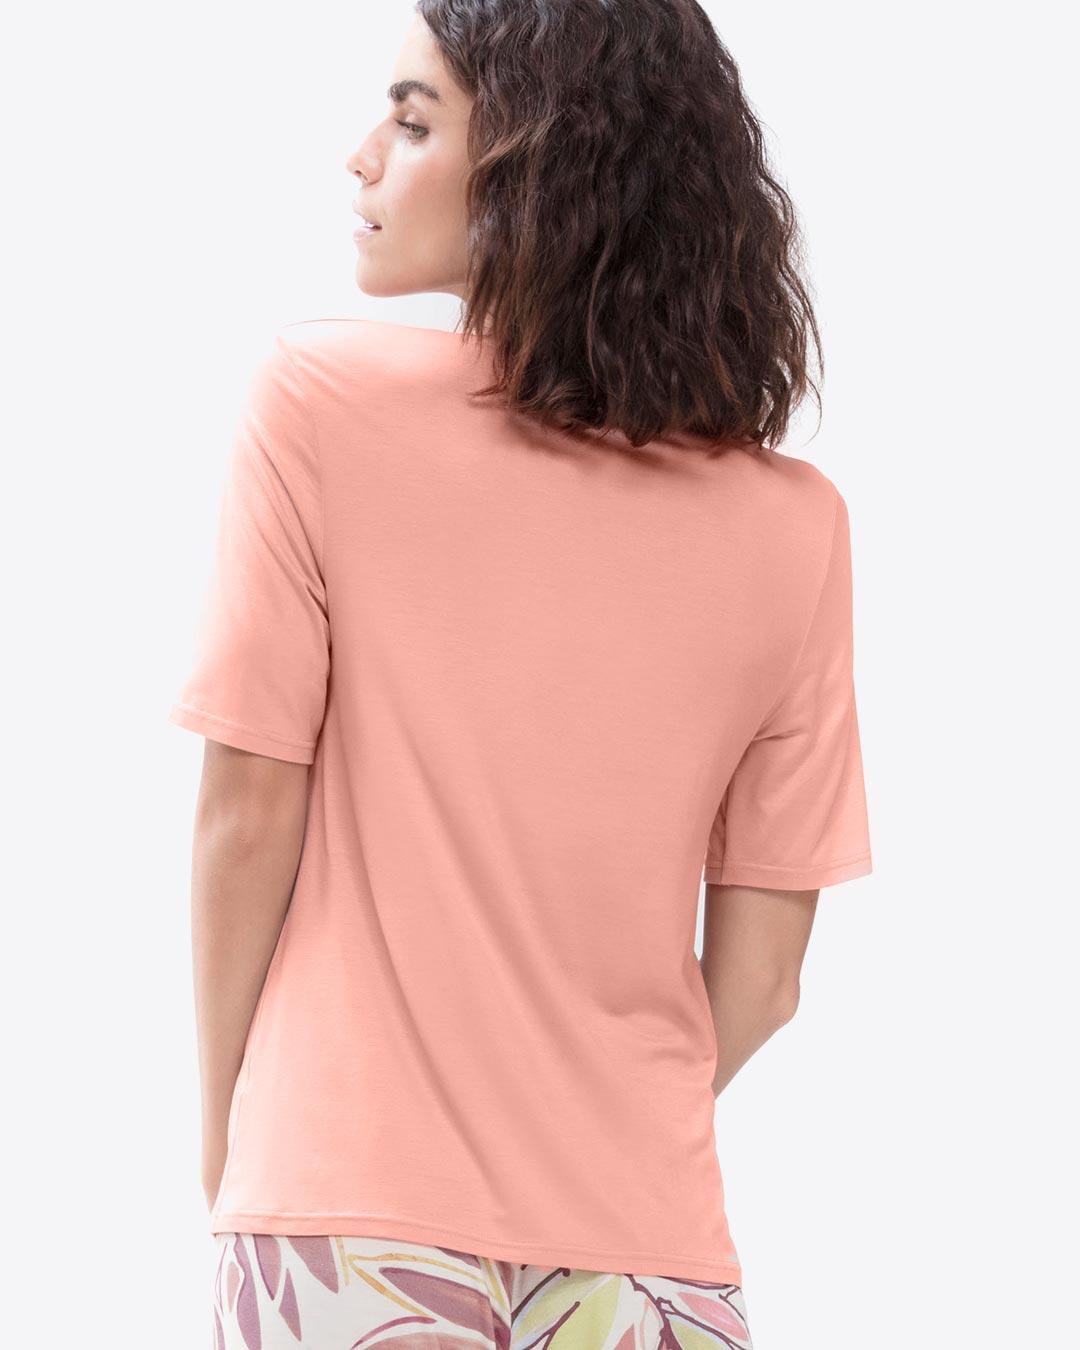 serie-alena-ss-top-pblush2-02-dianes-lingerie-vancouver-1080x1350